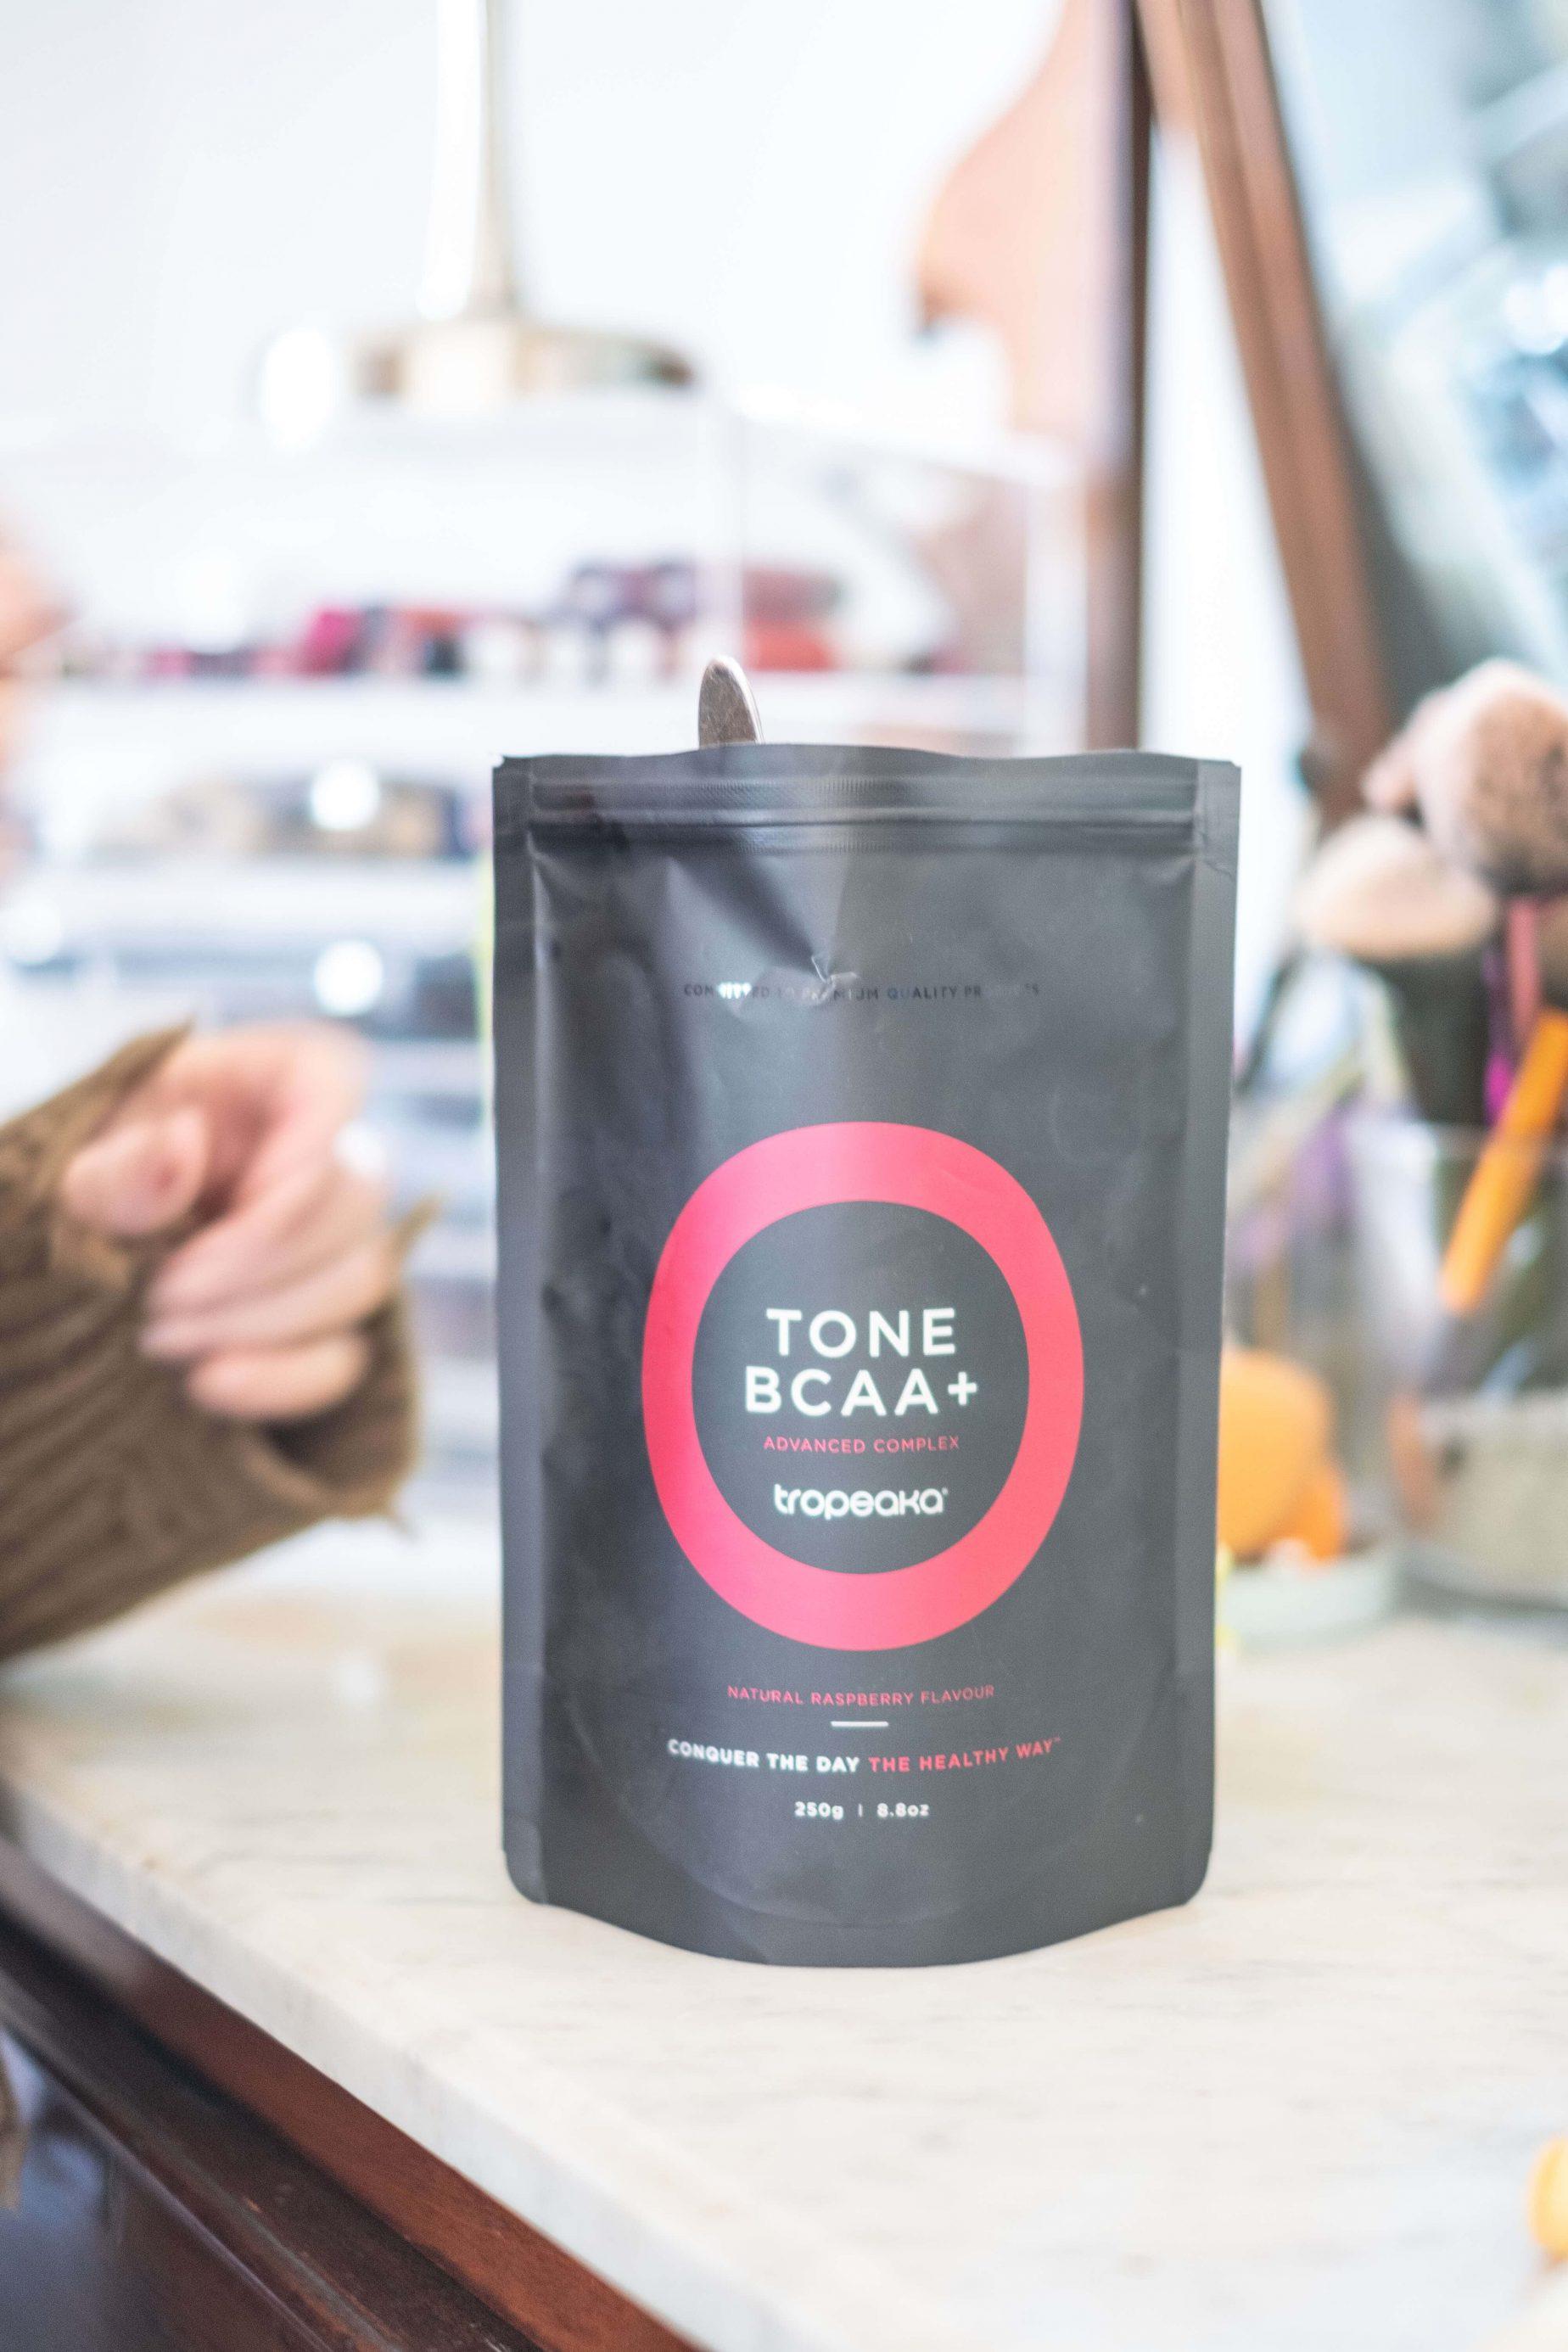 Tropeaka Tone BCAA Review- Do They Really Work- #whatsavvysaid #tropeaka #tropeakabcaa #cleaneating #tonebcaa #raspberry #tropeakareview #fitnessgoals #blenderbottle